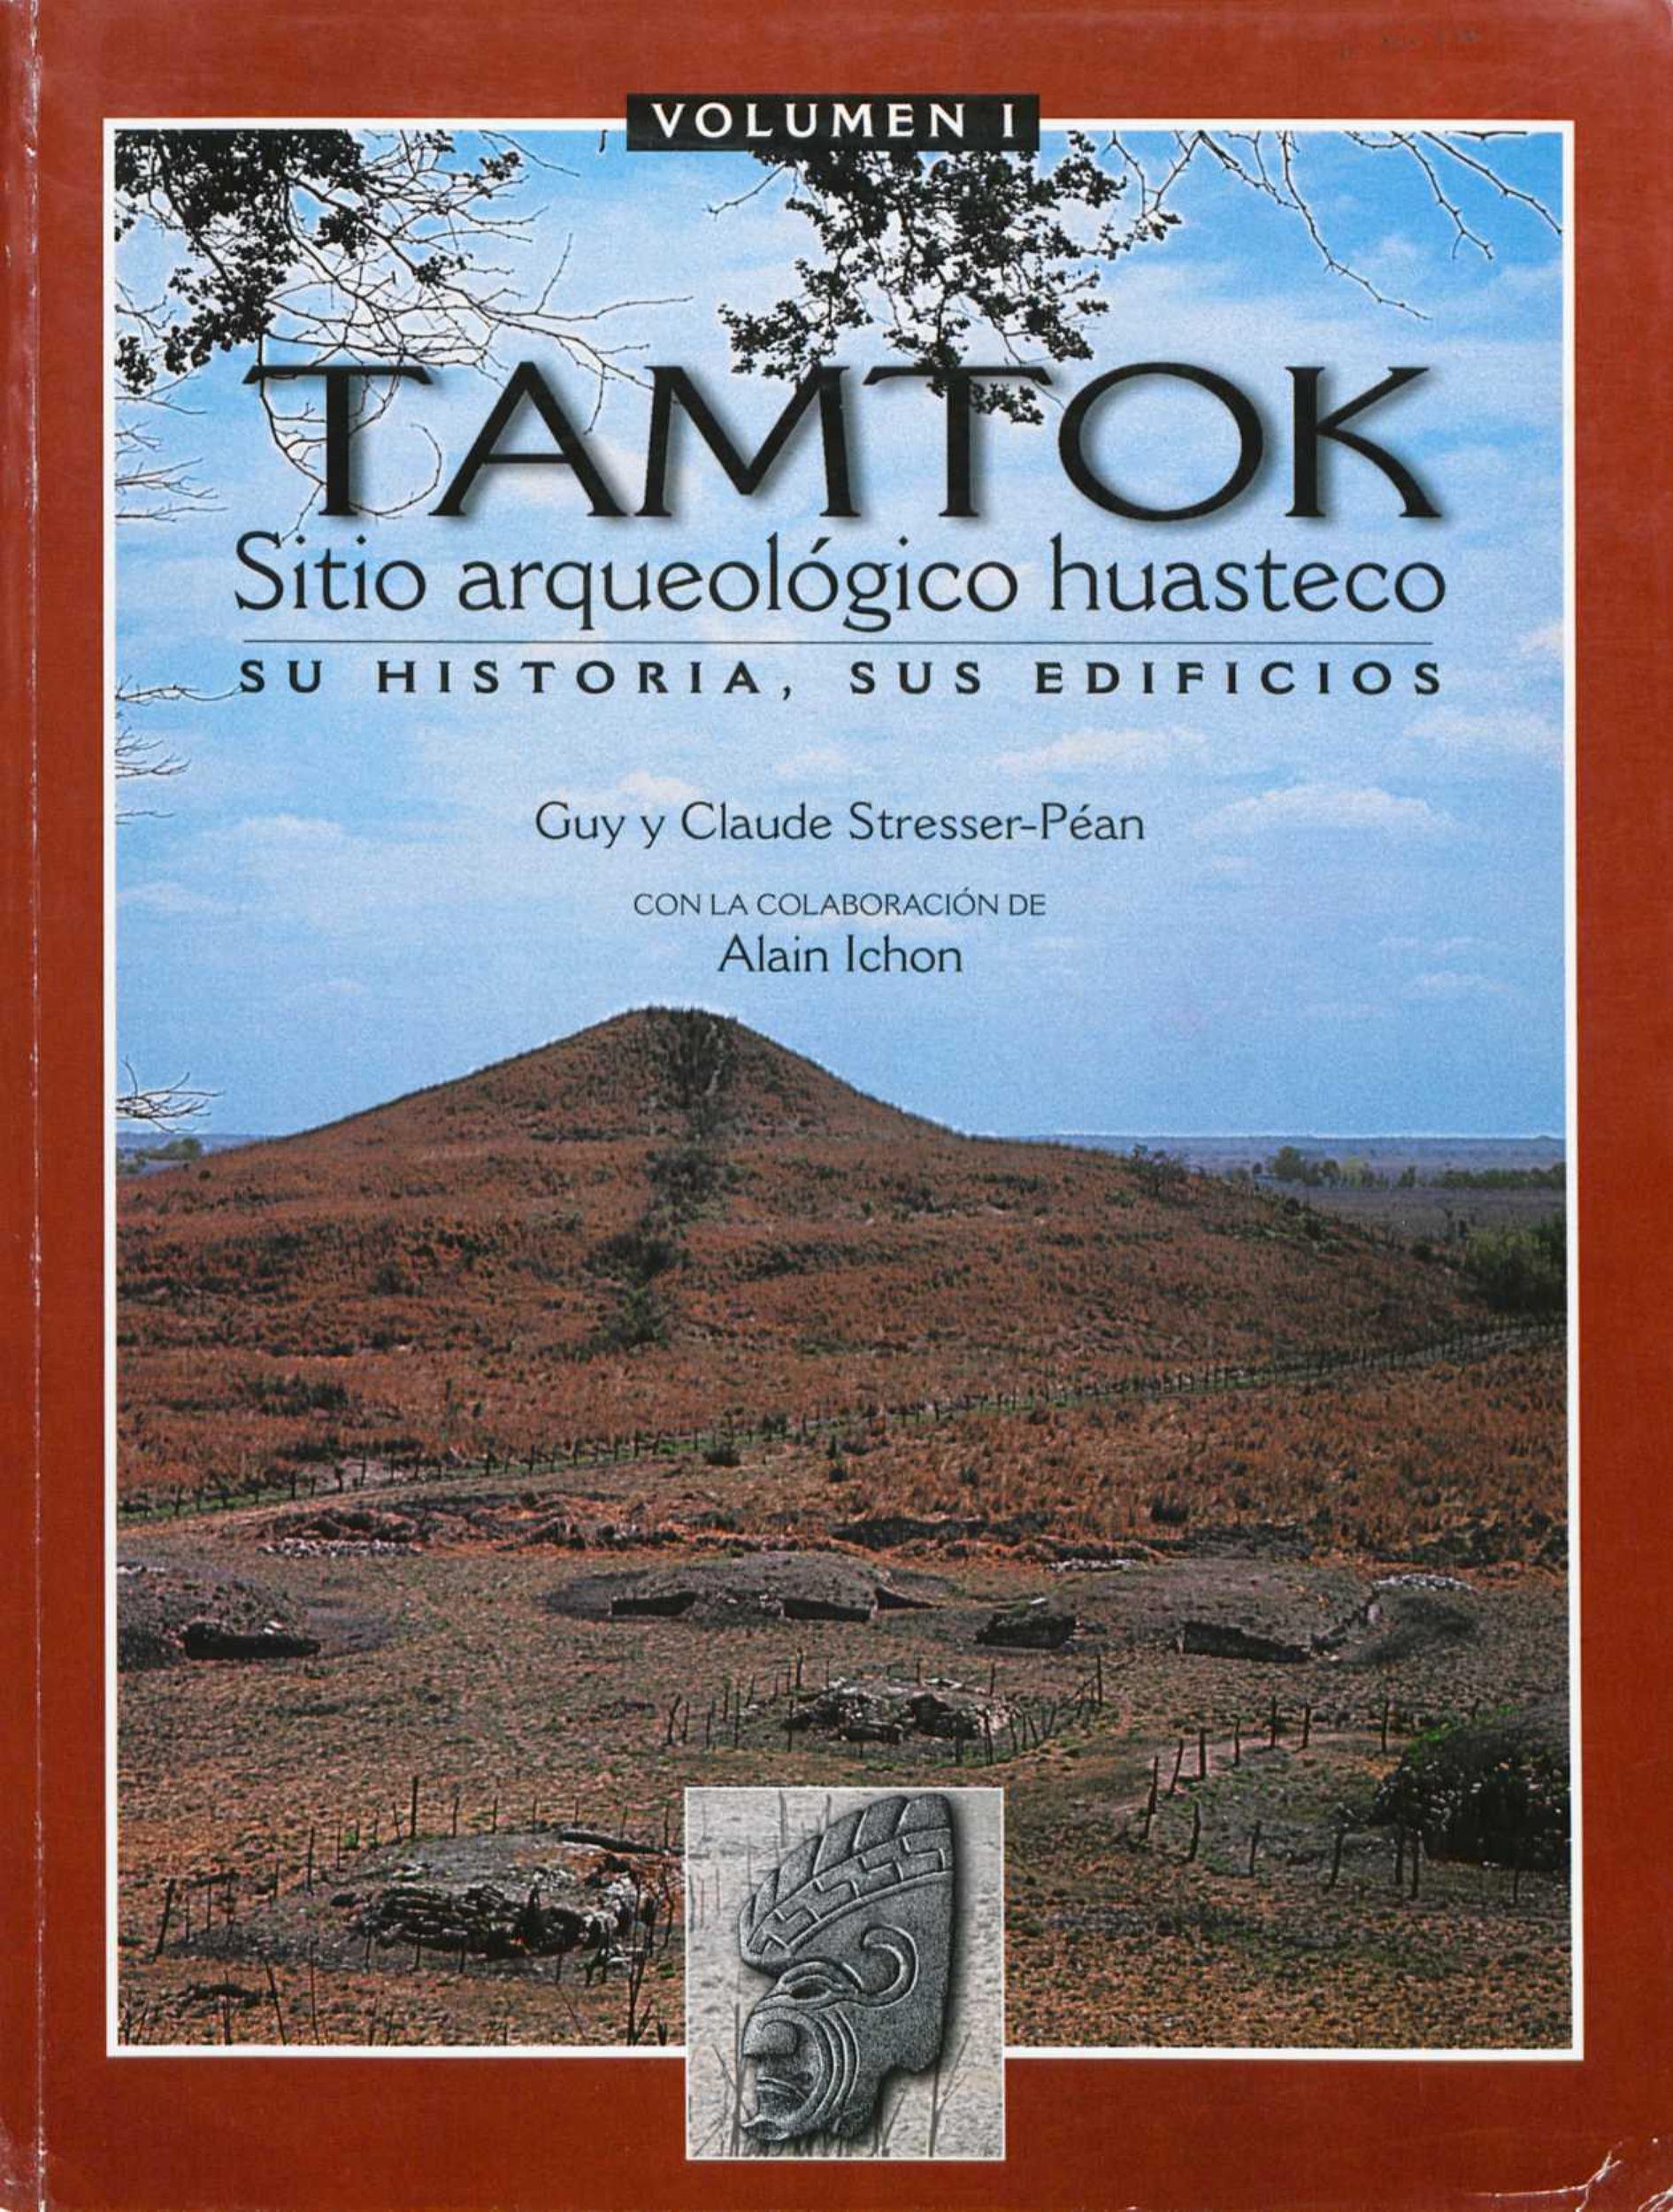 Tamtok, sitio arqueologico huasteco. Volumen I